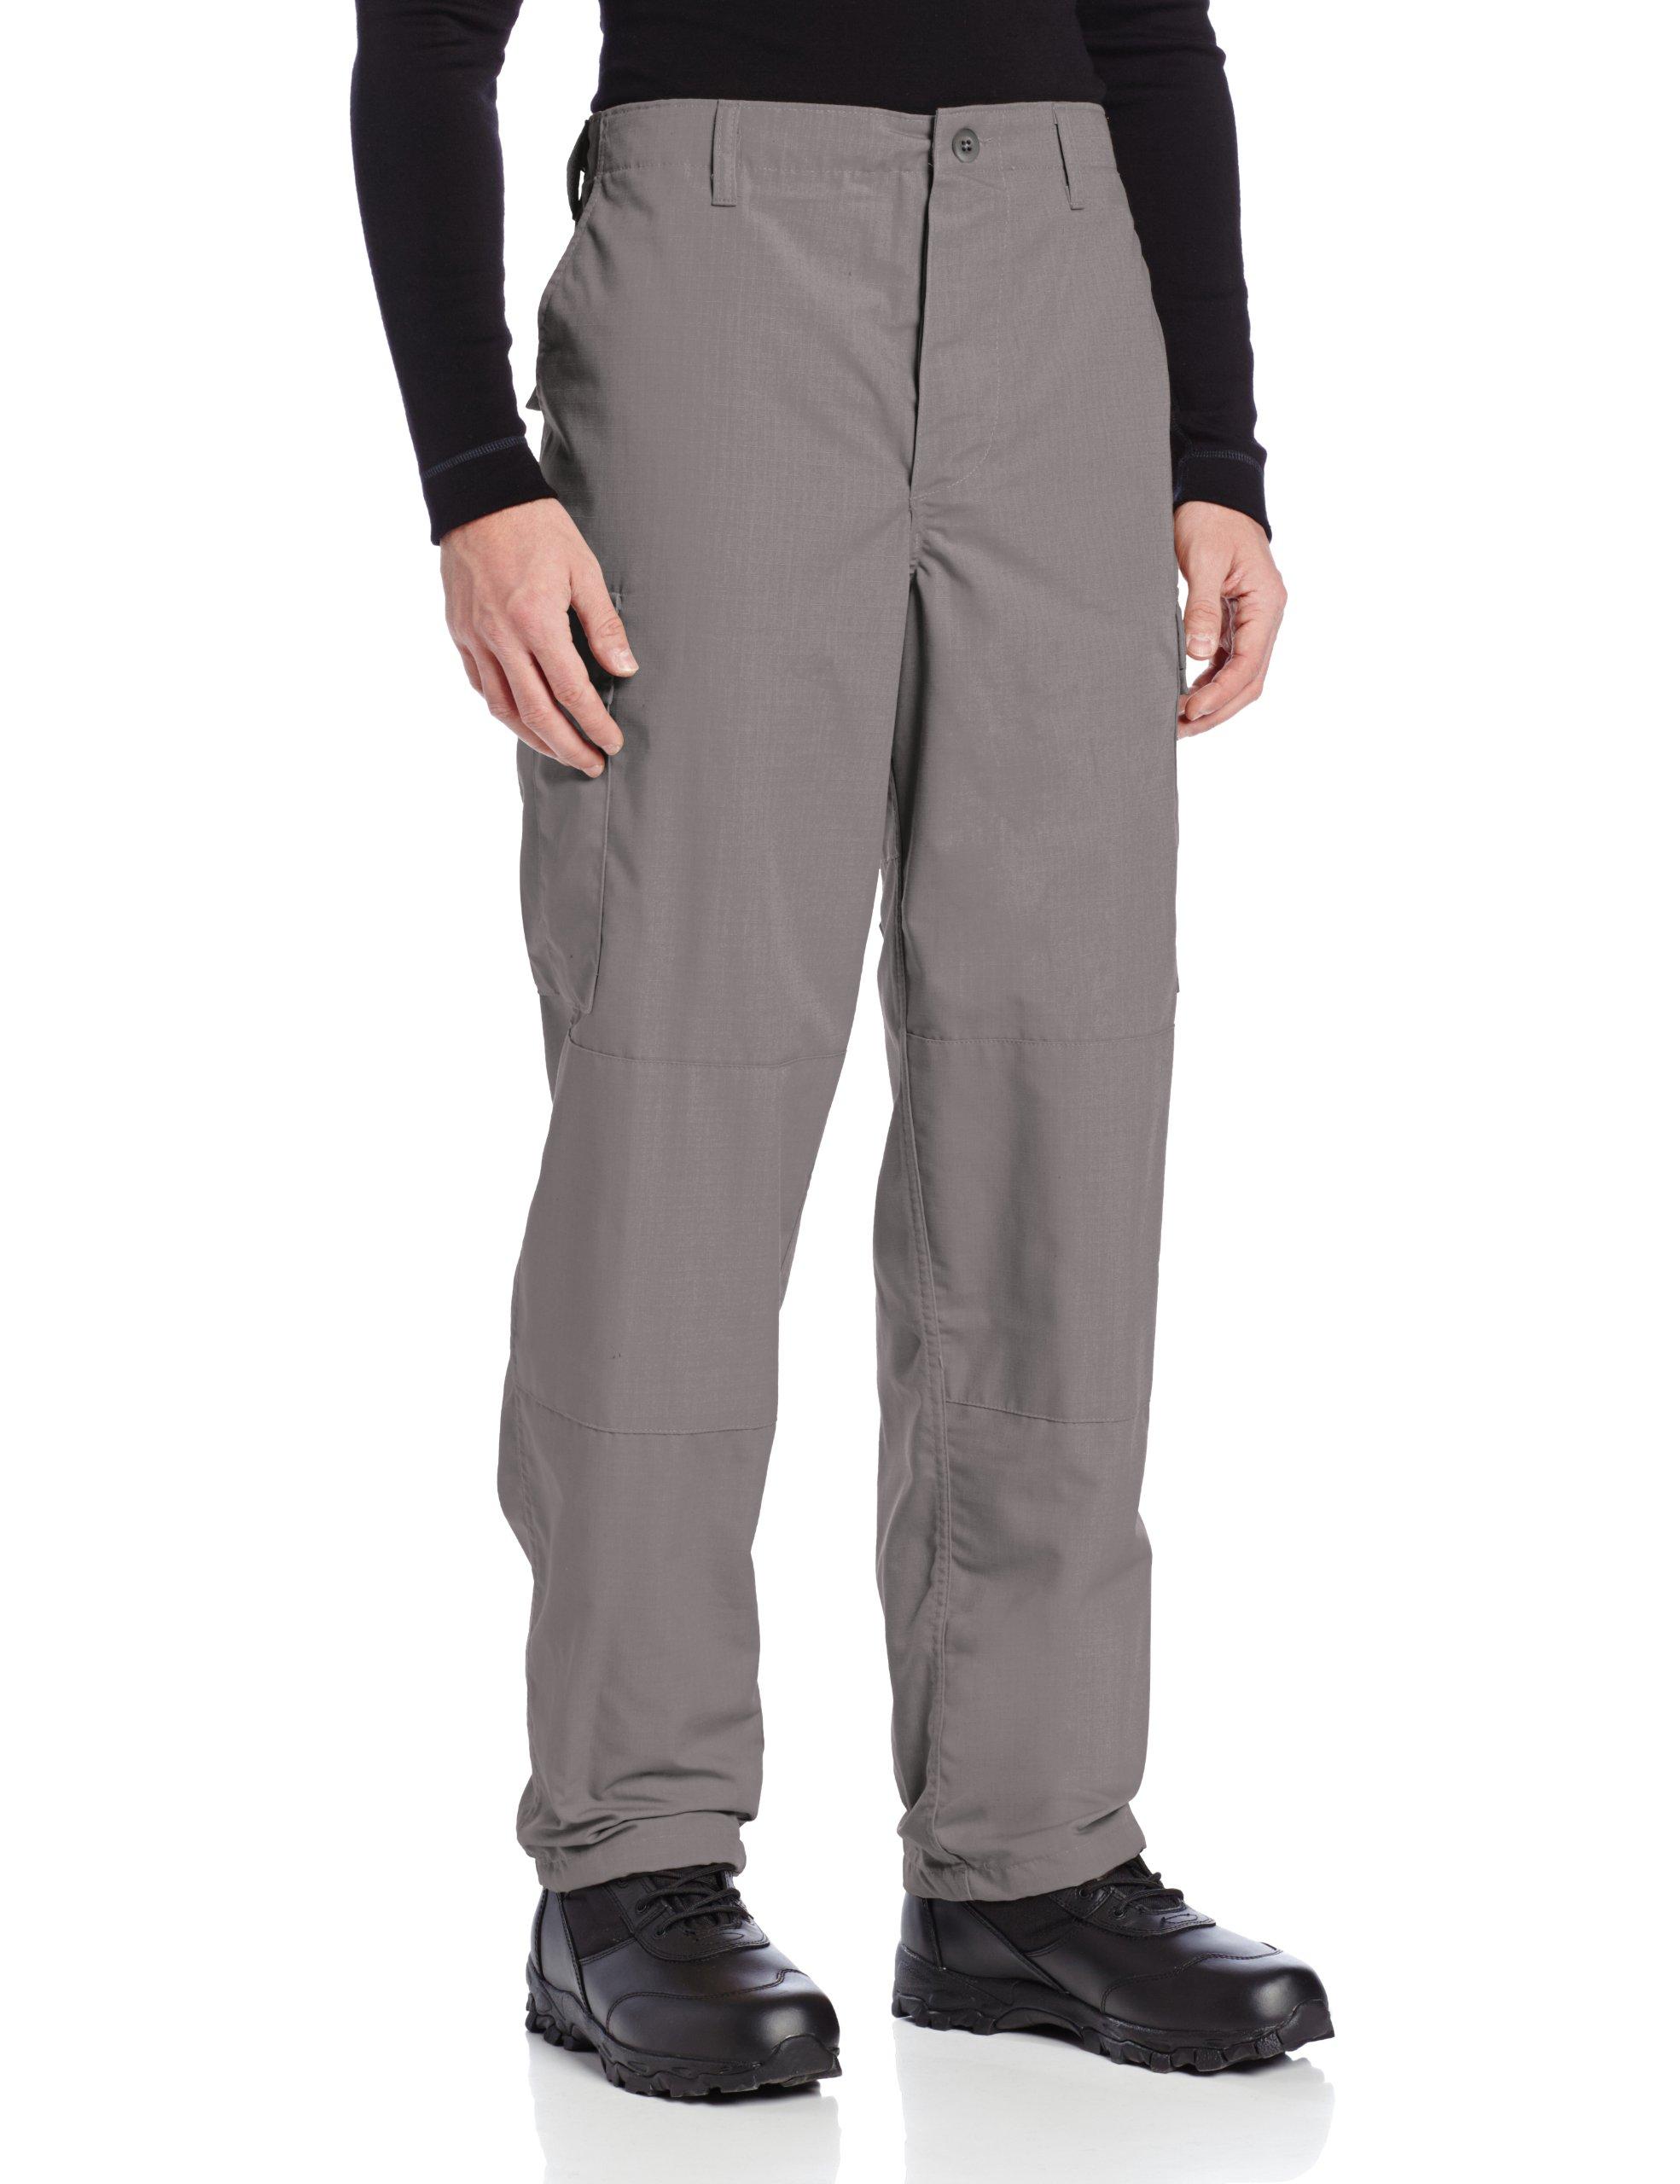 Tru-Spec Men's Polyester Cotton Rip Stop BDU Pant, Grey, X-Small Long